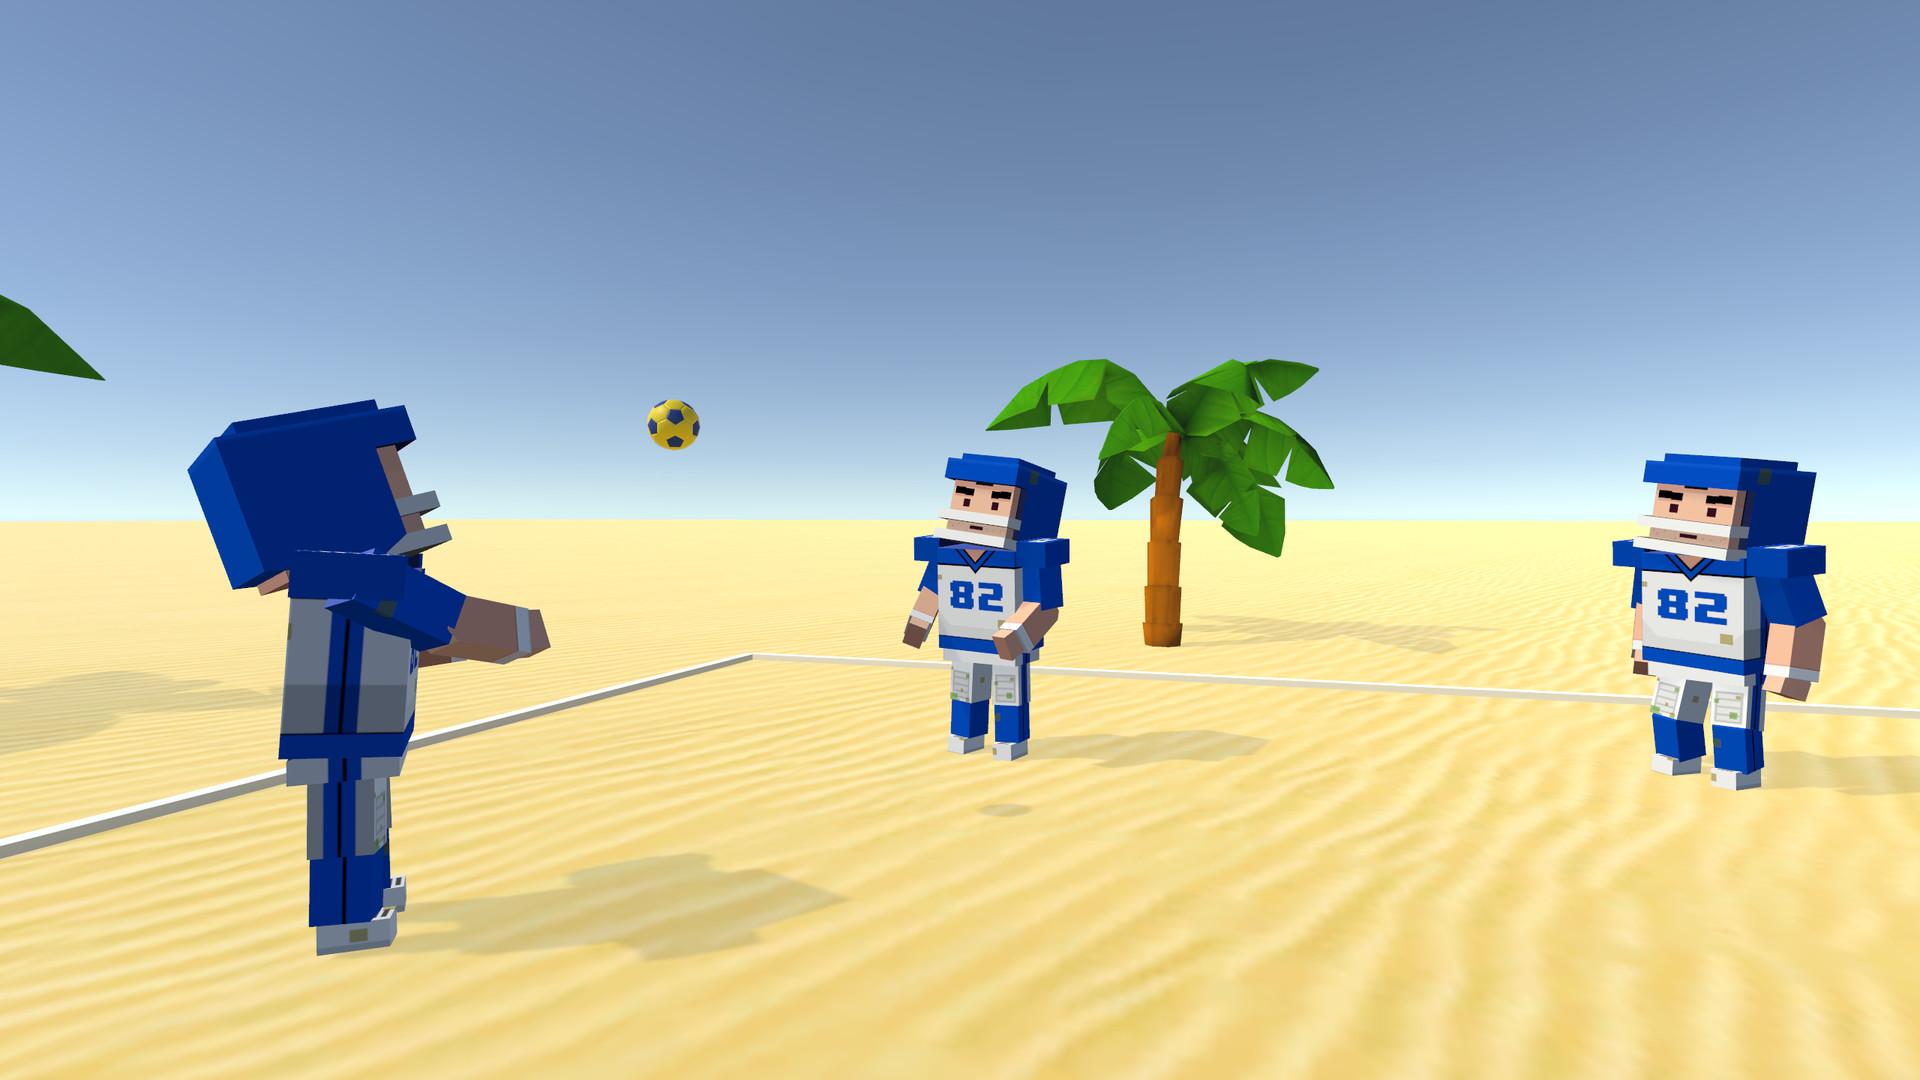 Oculus Quest 游戏《Volleyball Fever》狂热排球插图(2)